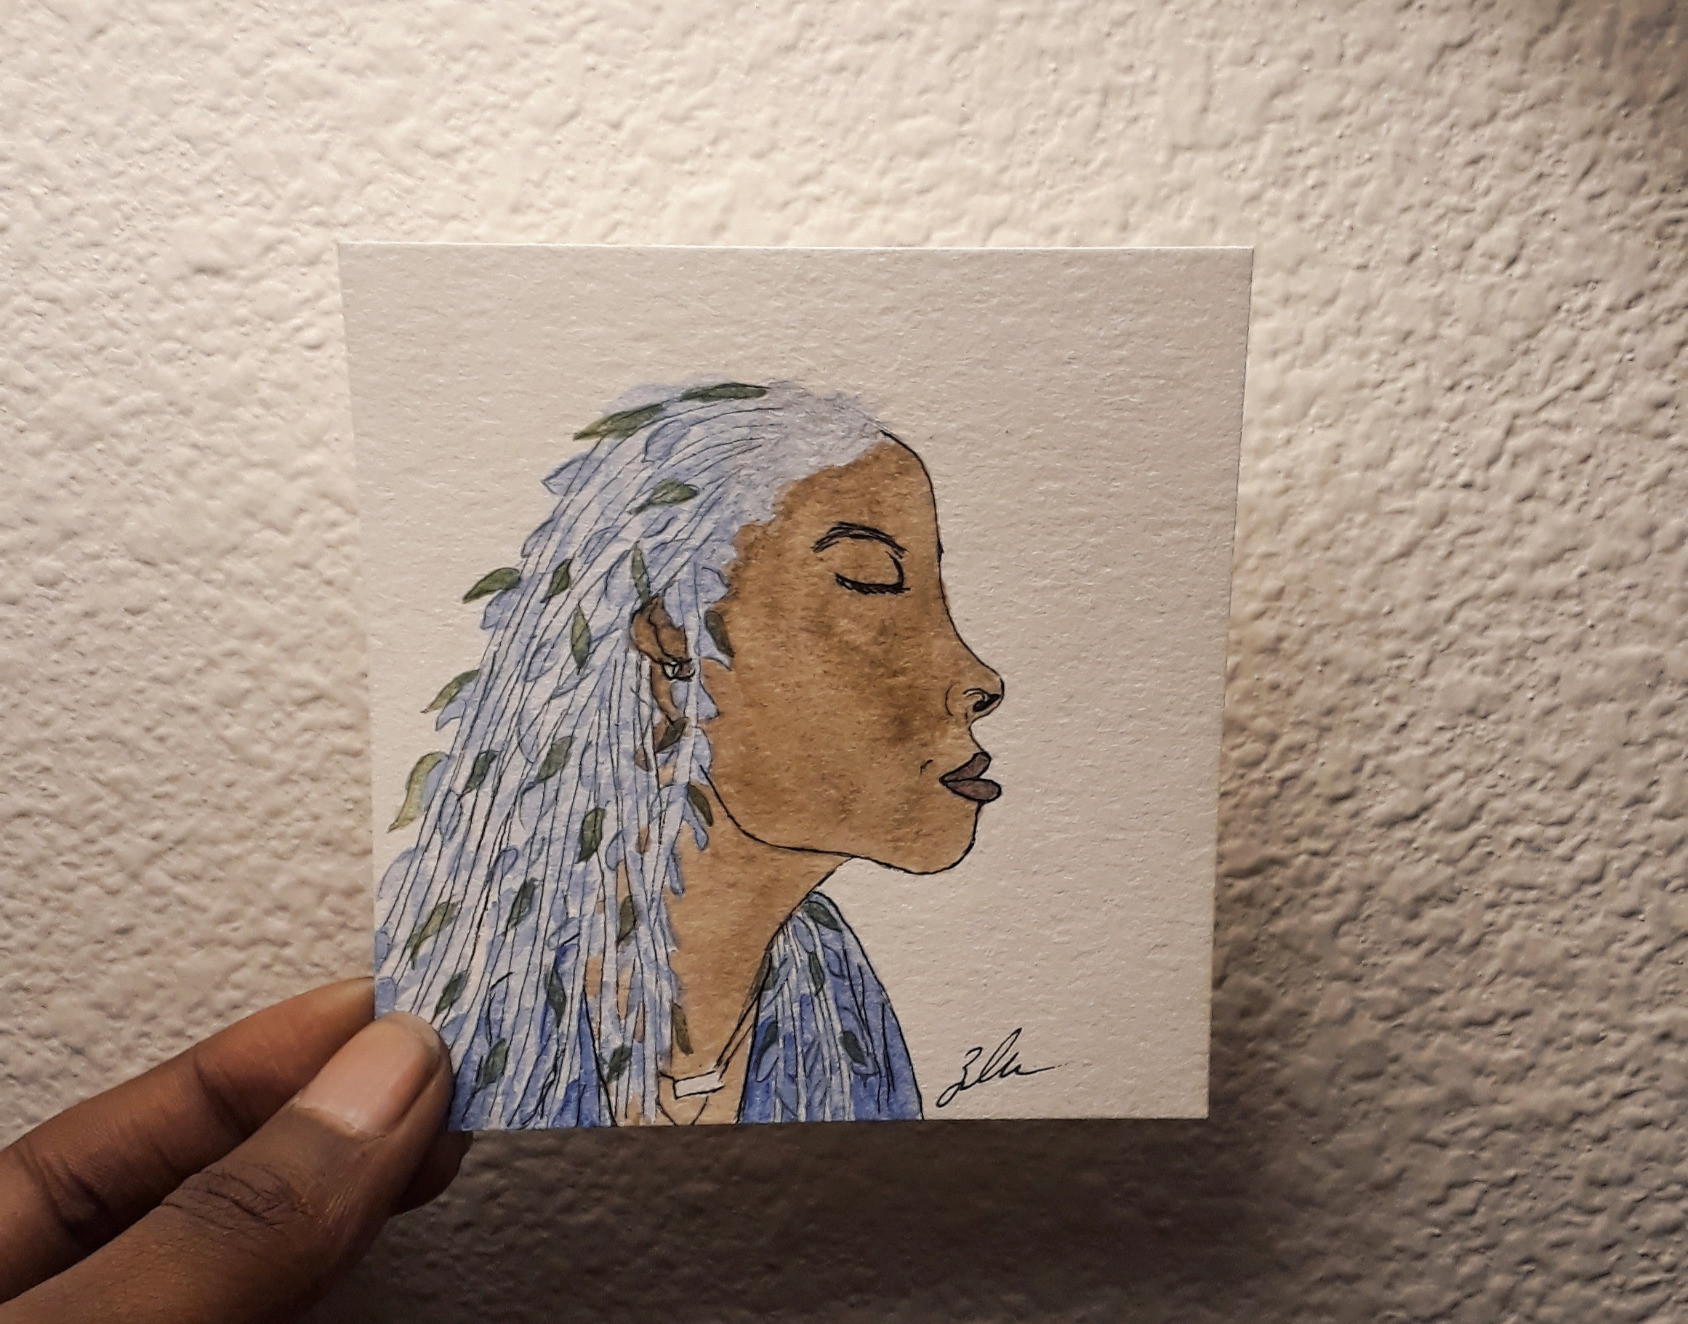 Self Portrait 9.22.20